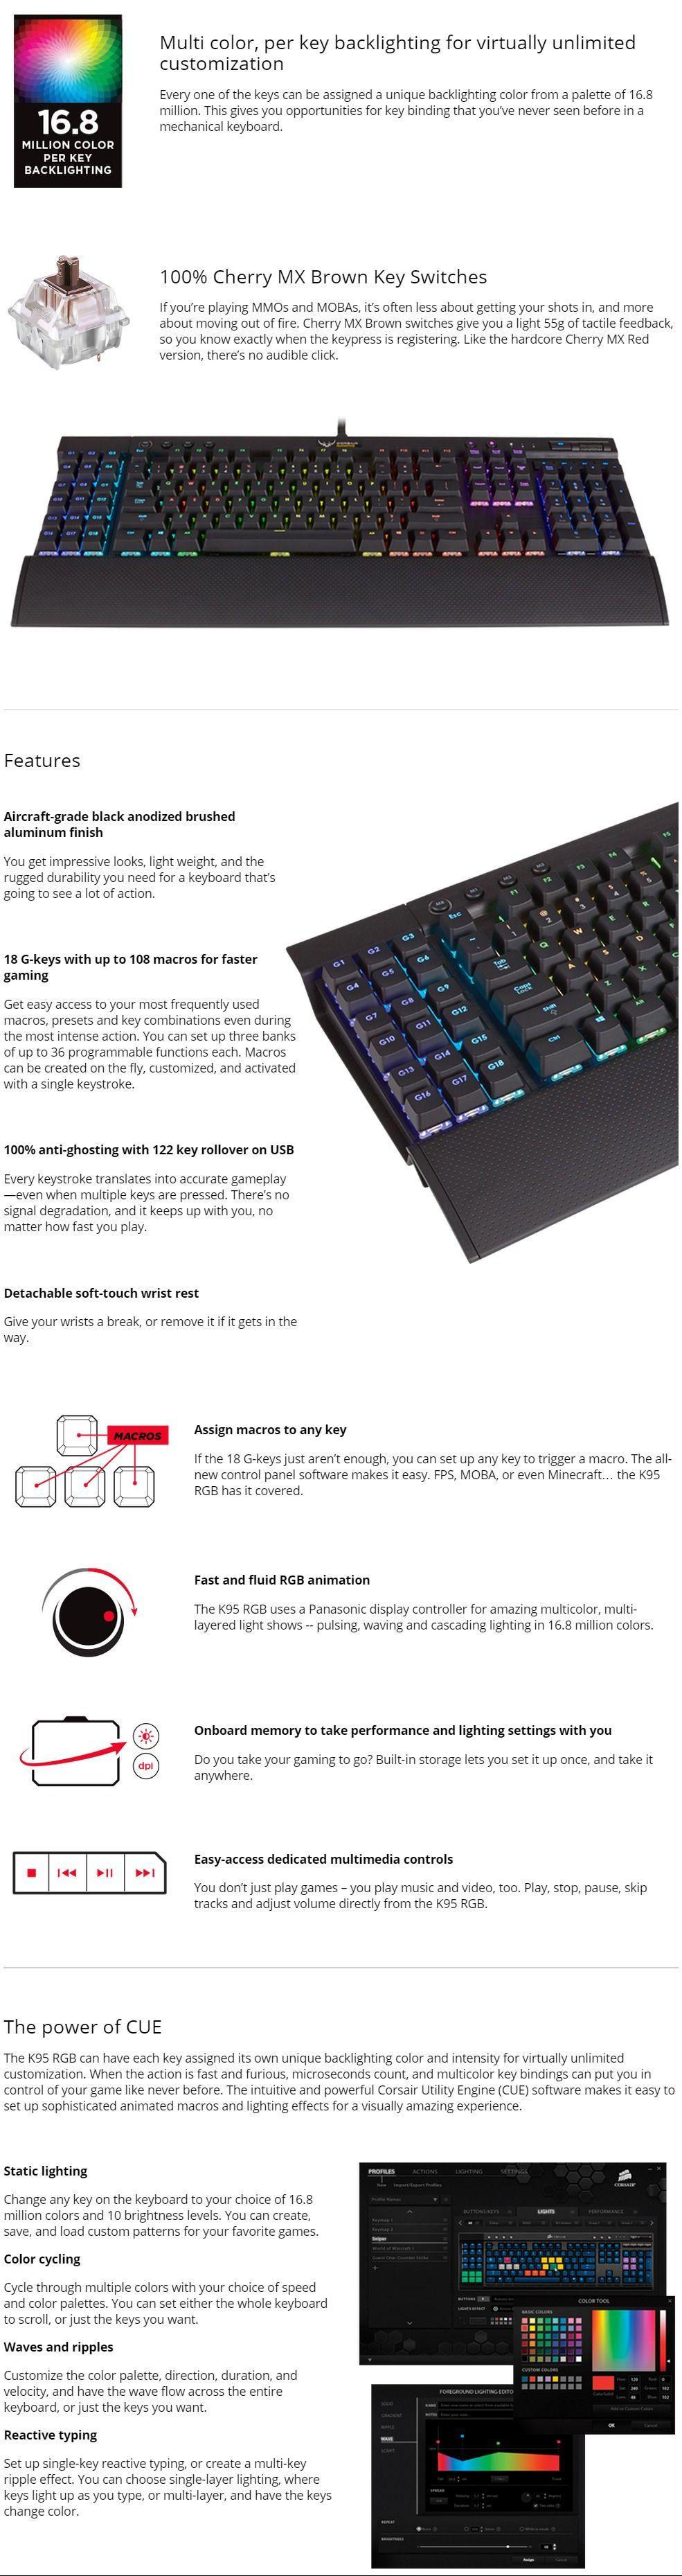 Corsair Gaming K95 RGB LED Mechanical Gaming Keyboard - Cherry BROWN,  Multicolor per Key Backli